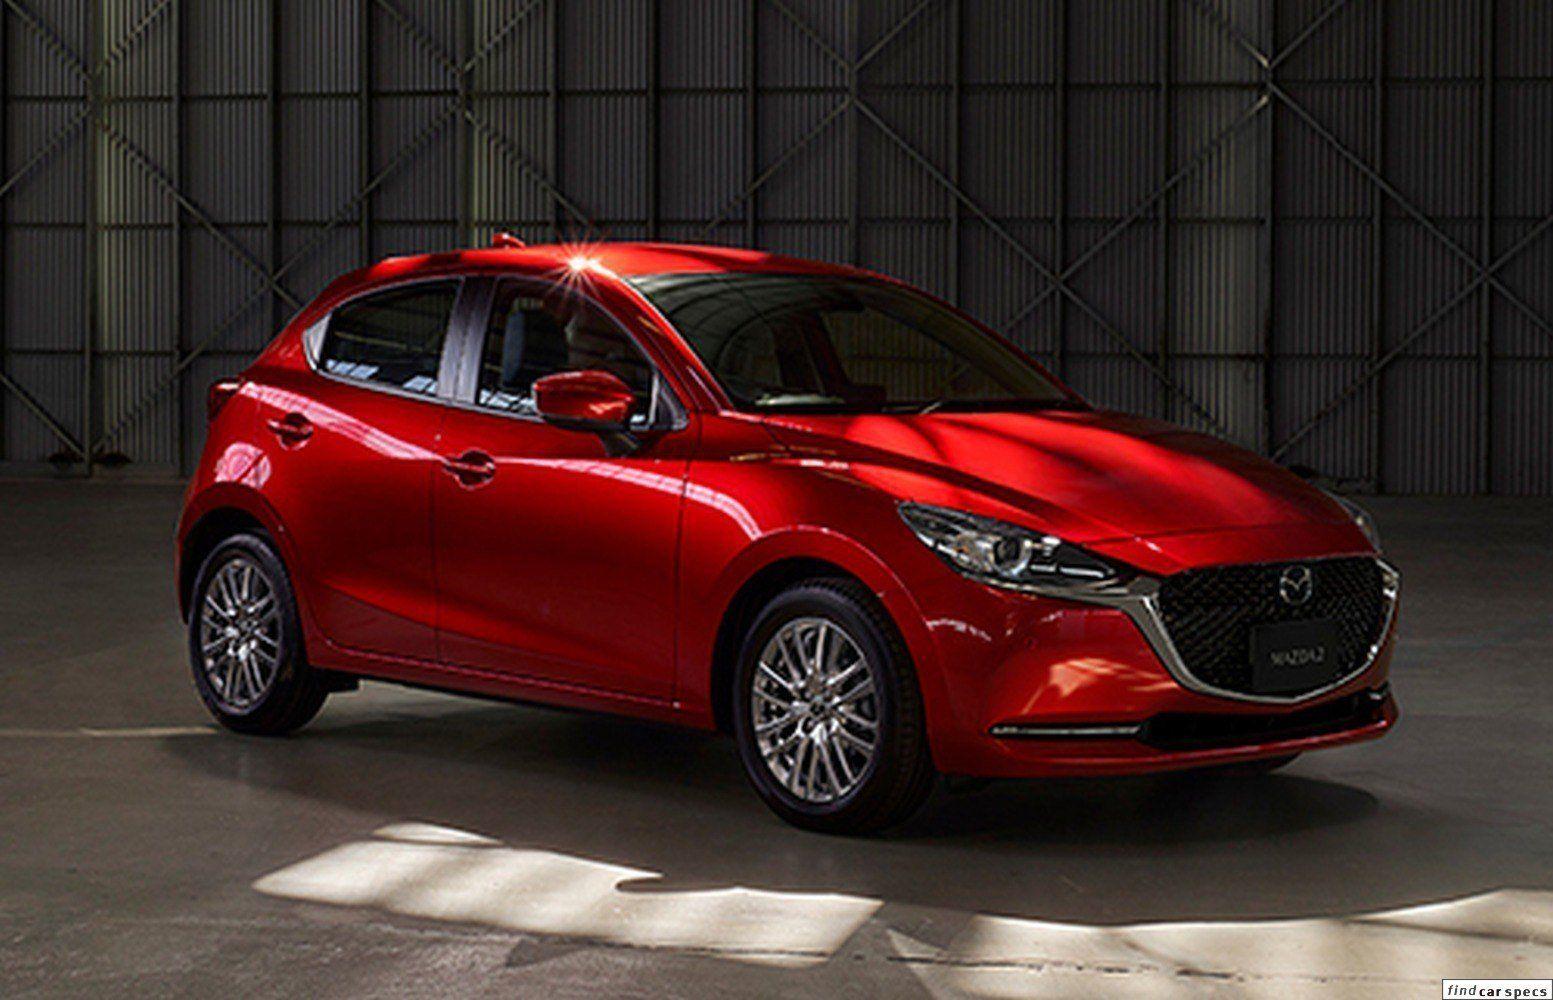 Good Kendrick B 06 11 2019 Performance Mazda 2 2 Iii Dj Facelift 2019 1 5 Skyactiv G 90 Hp Petrol Gasoline Mazda Mazda 2 Hatchback